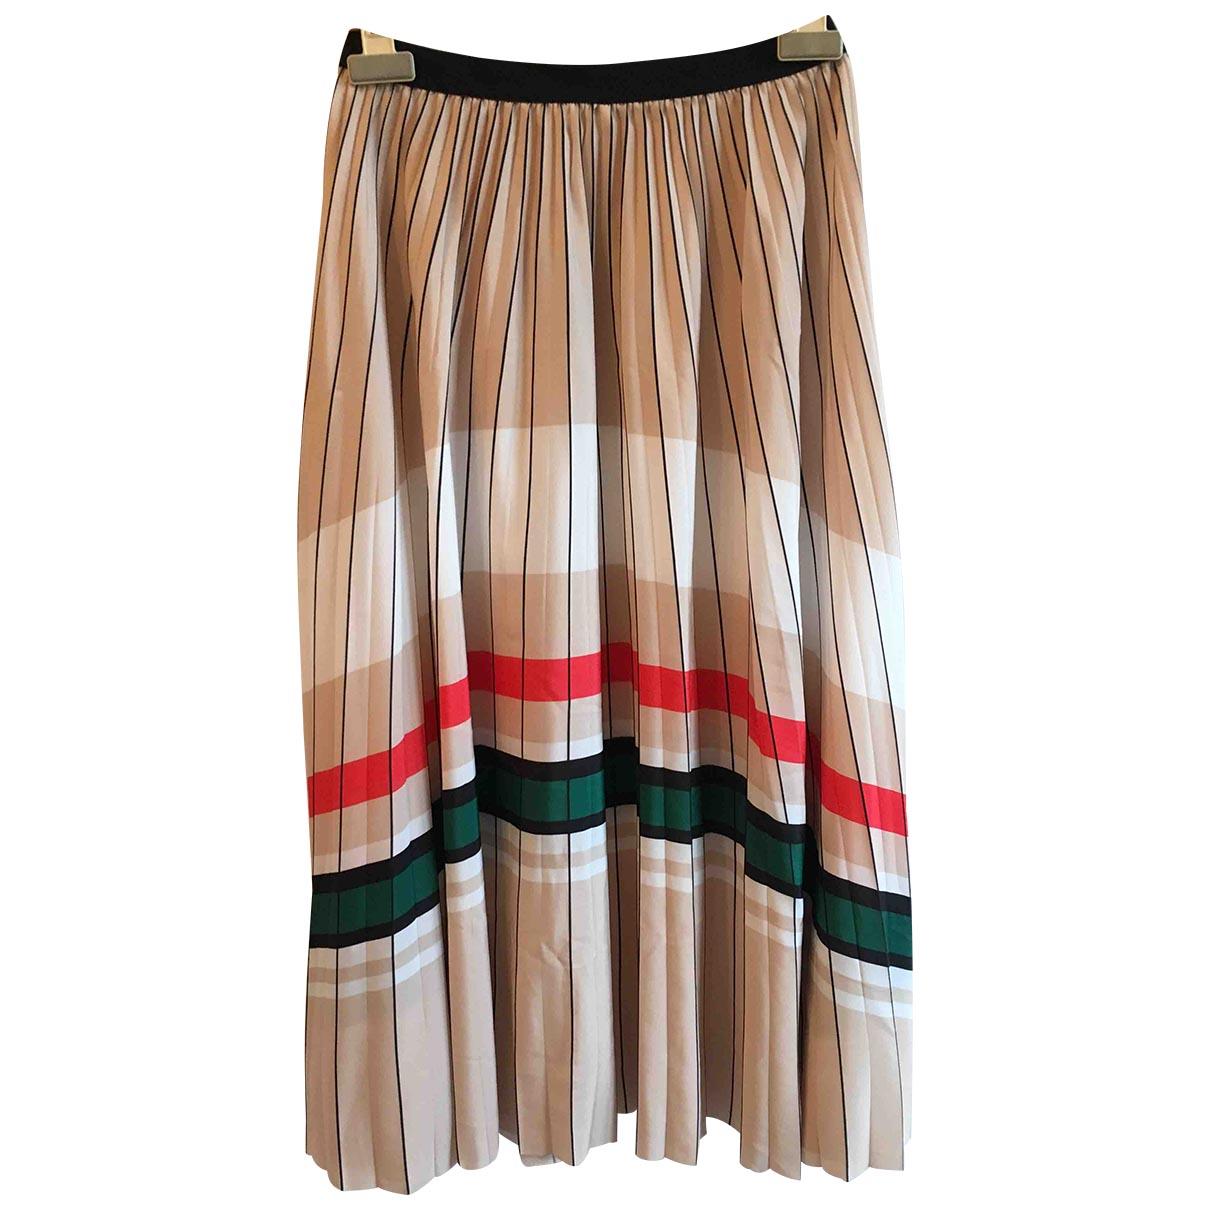 Claudie Pierlot Spring Summer 2019 Beige skirt for Women 36 FR